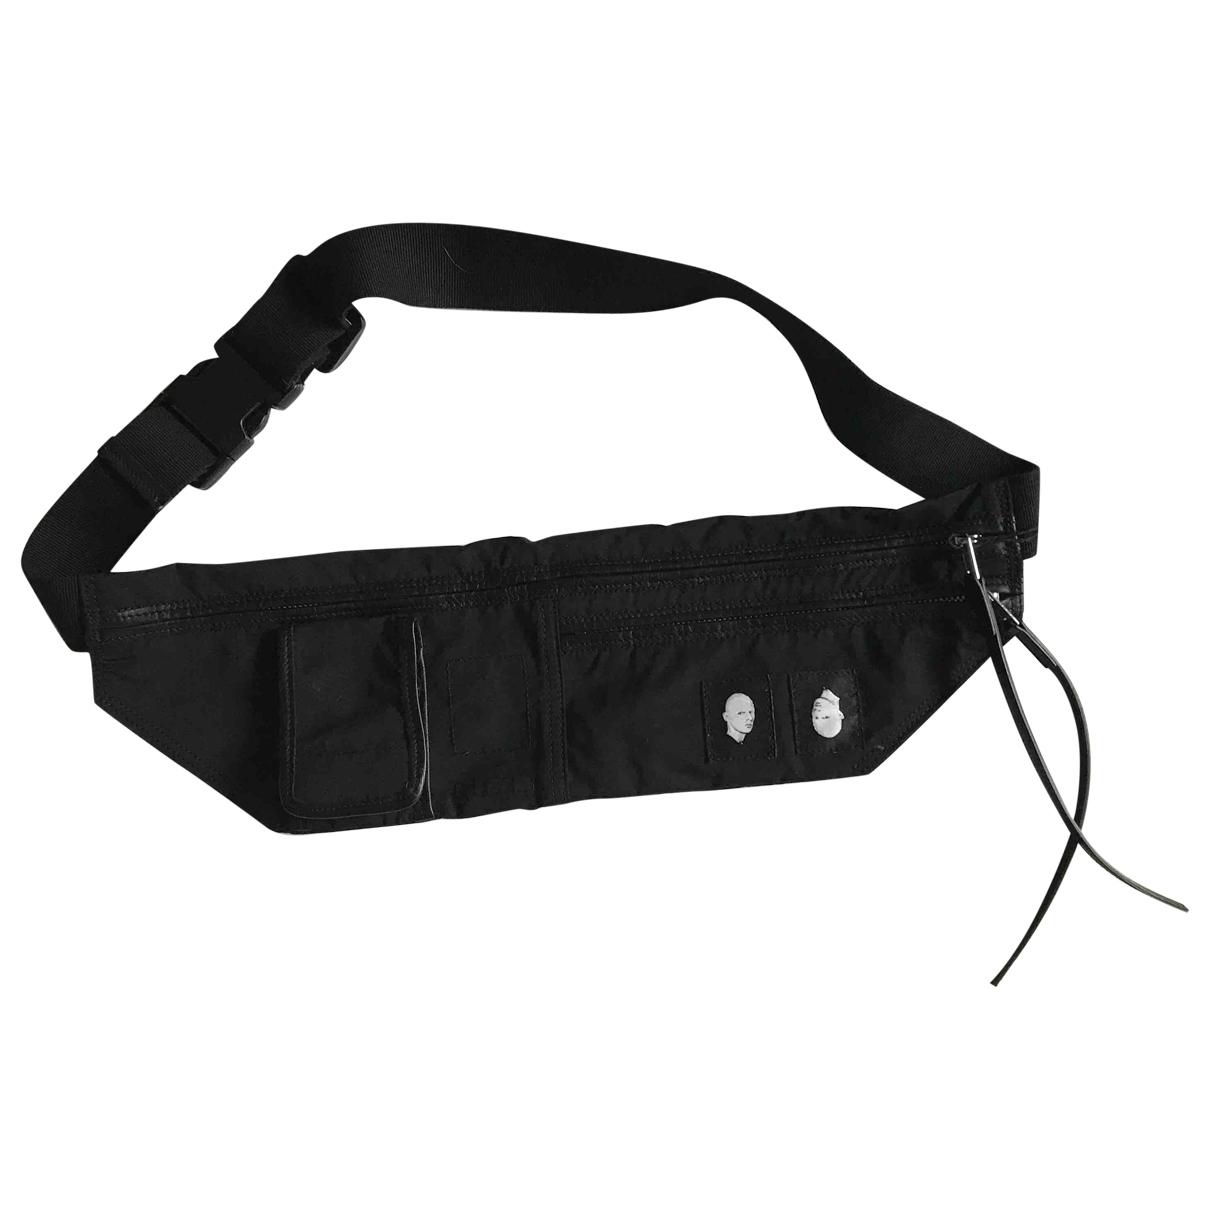 Rick Owens Drkshdw \N Black Small bag, wallet & cases for Men \N